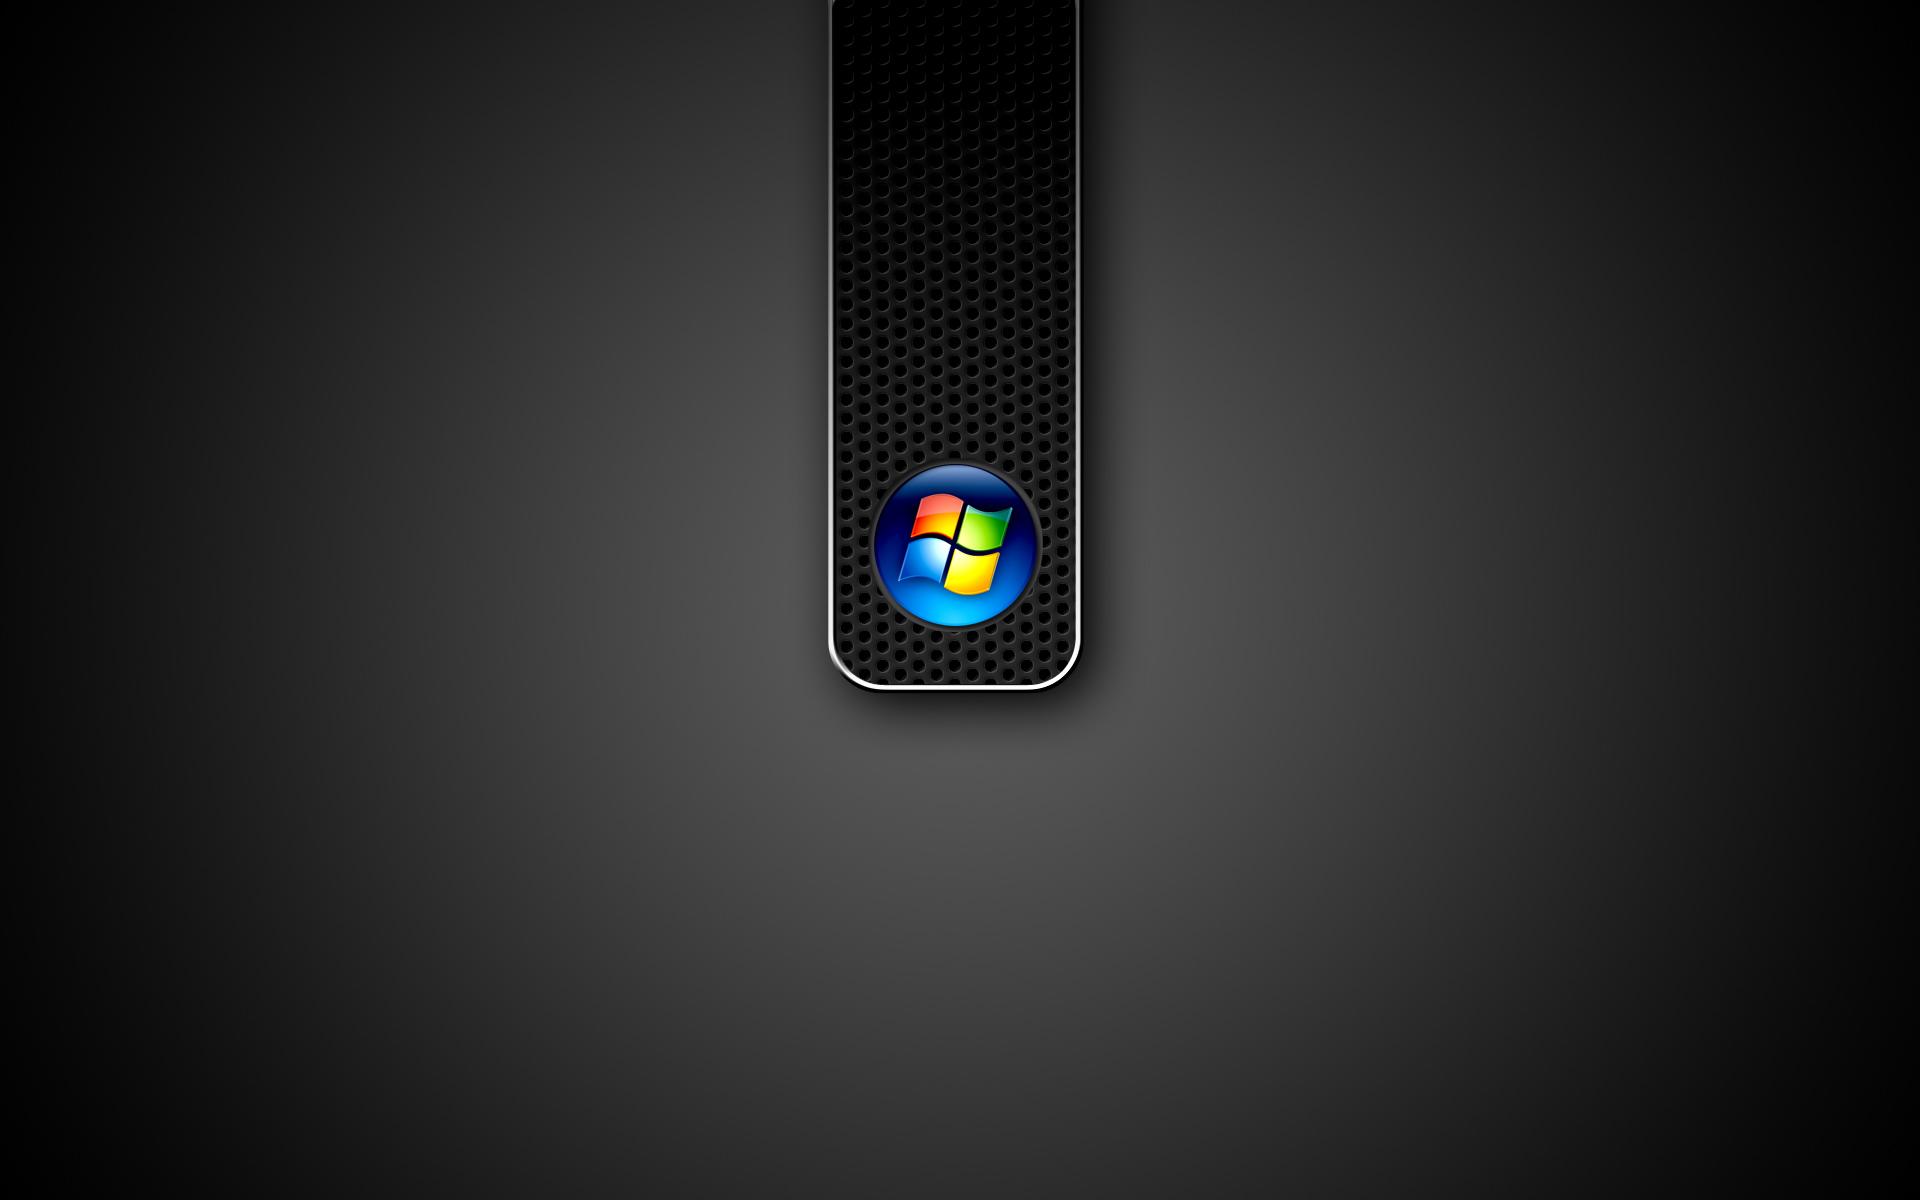 Windows 7 Black Wallpaper Hd 24 Free Wallpaper